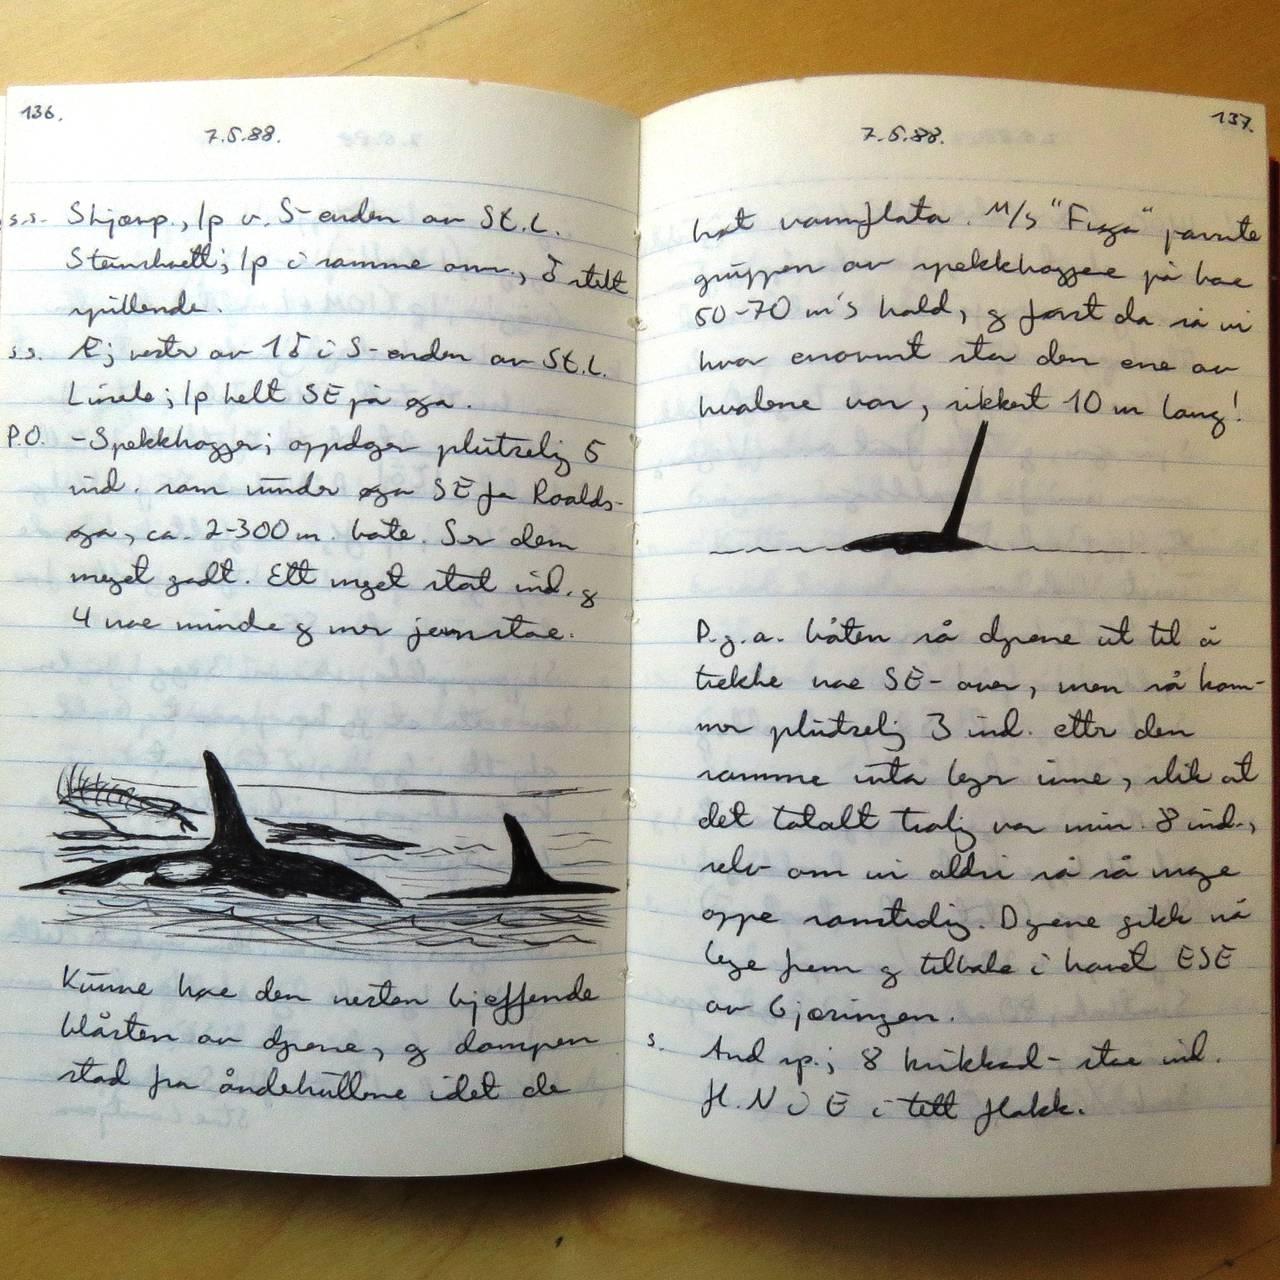 Tors dagbok, 1988.